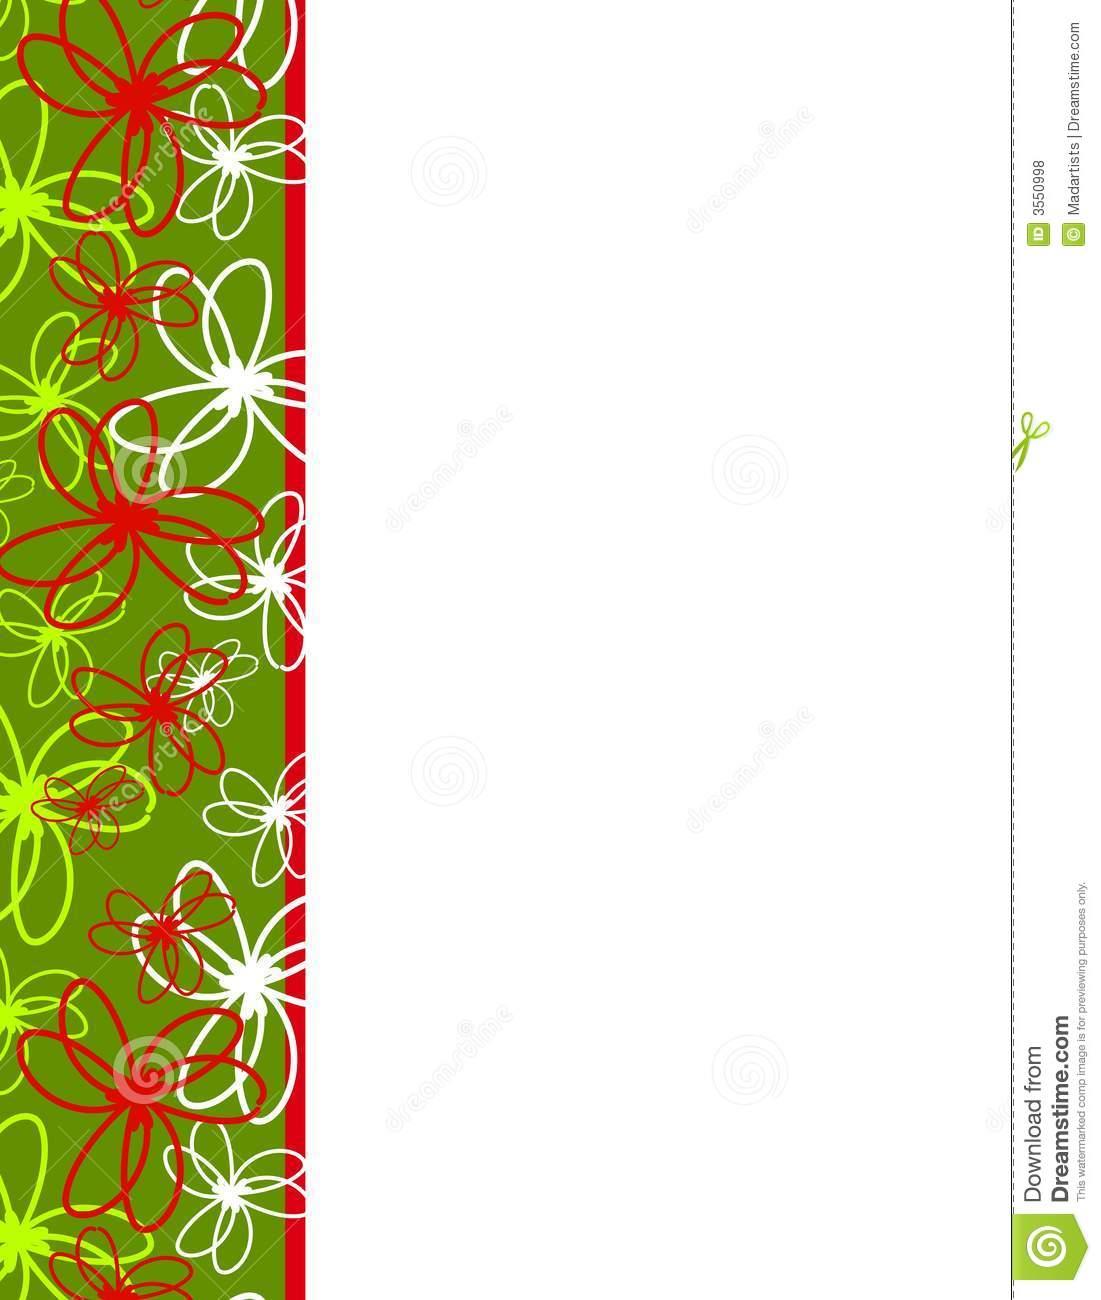 f6e0988f6cd2f6eefd092a053e4b10 ... f6e0988f6cd2f6eefd092a053e4b10 ... christmas clipart borders